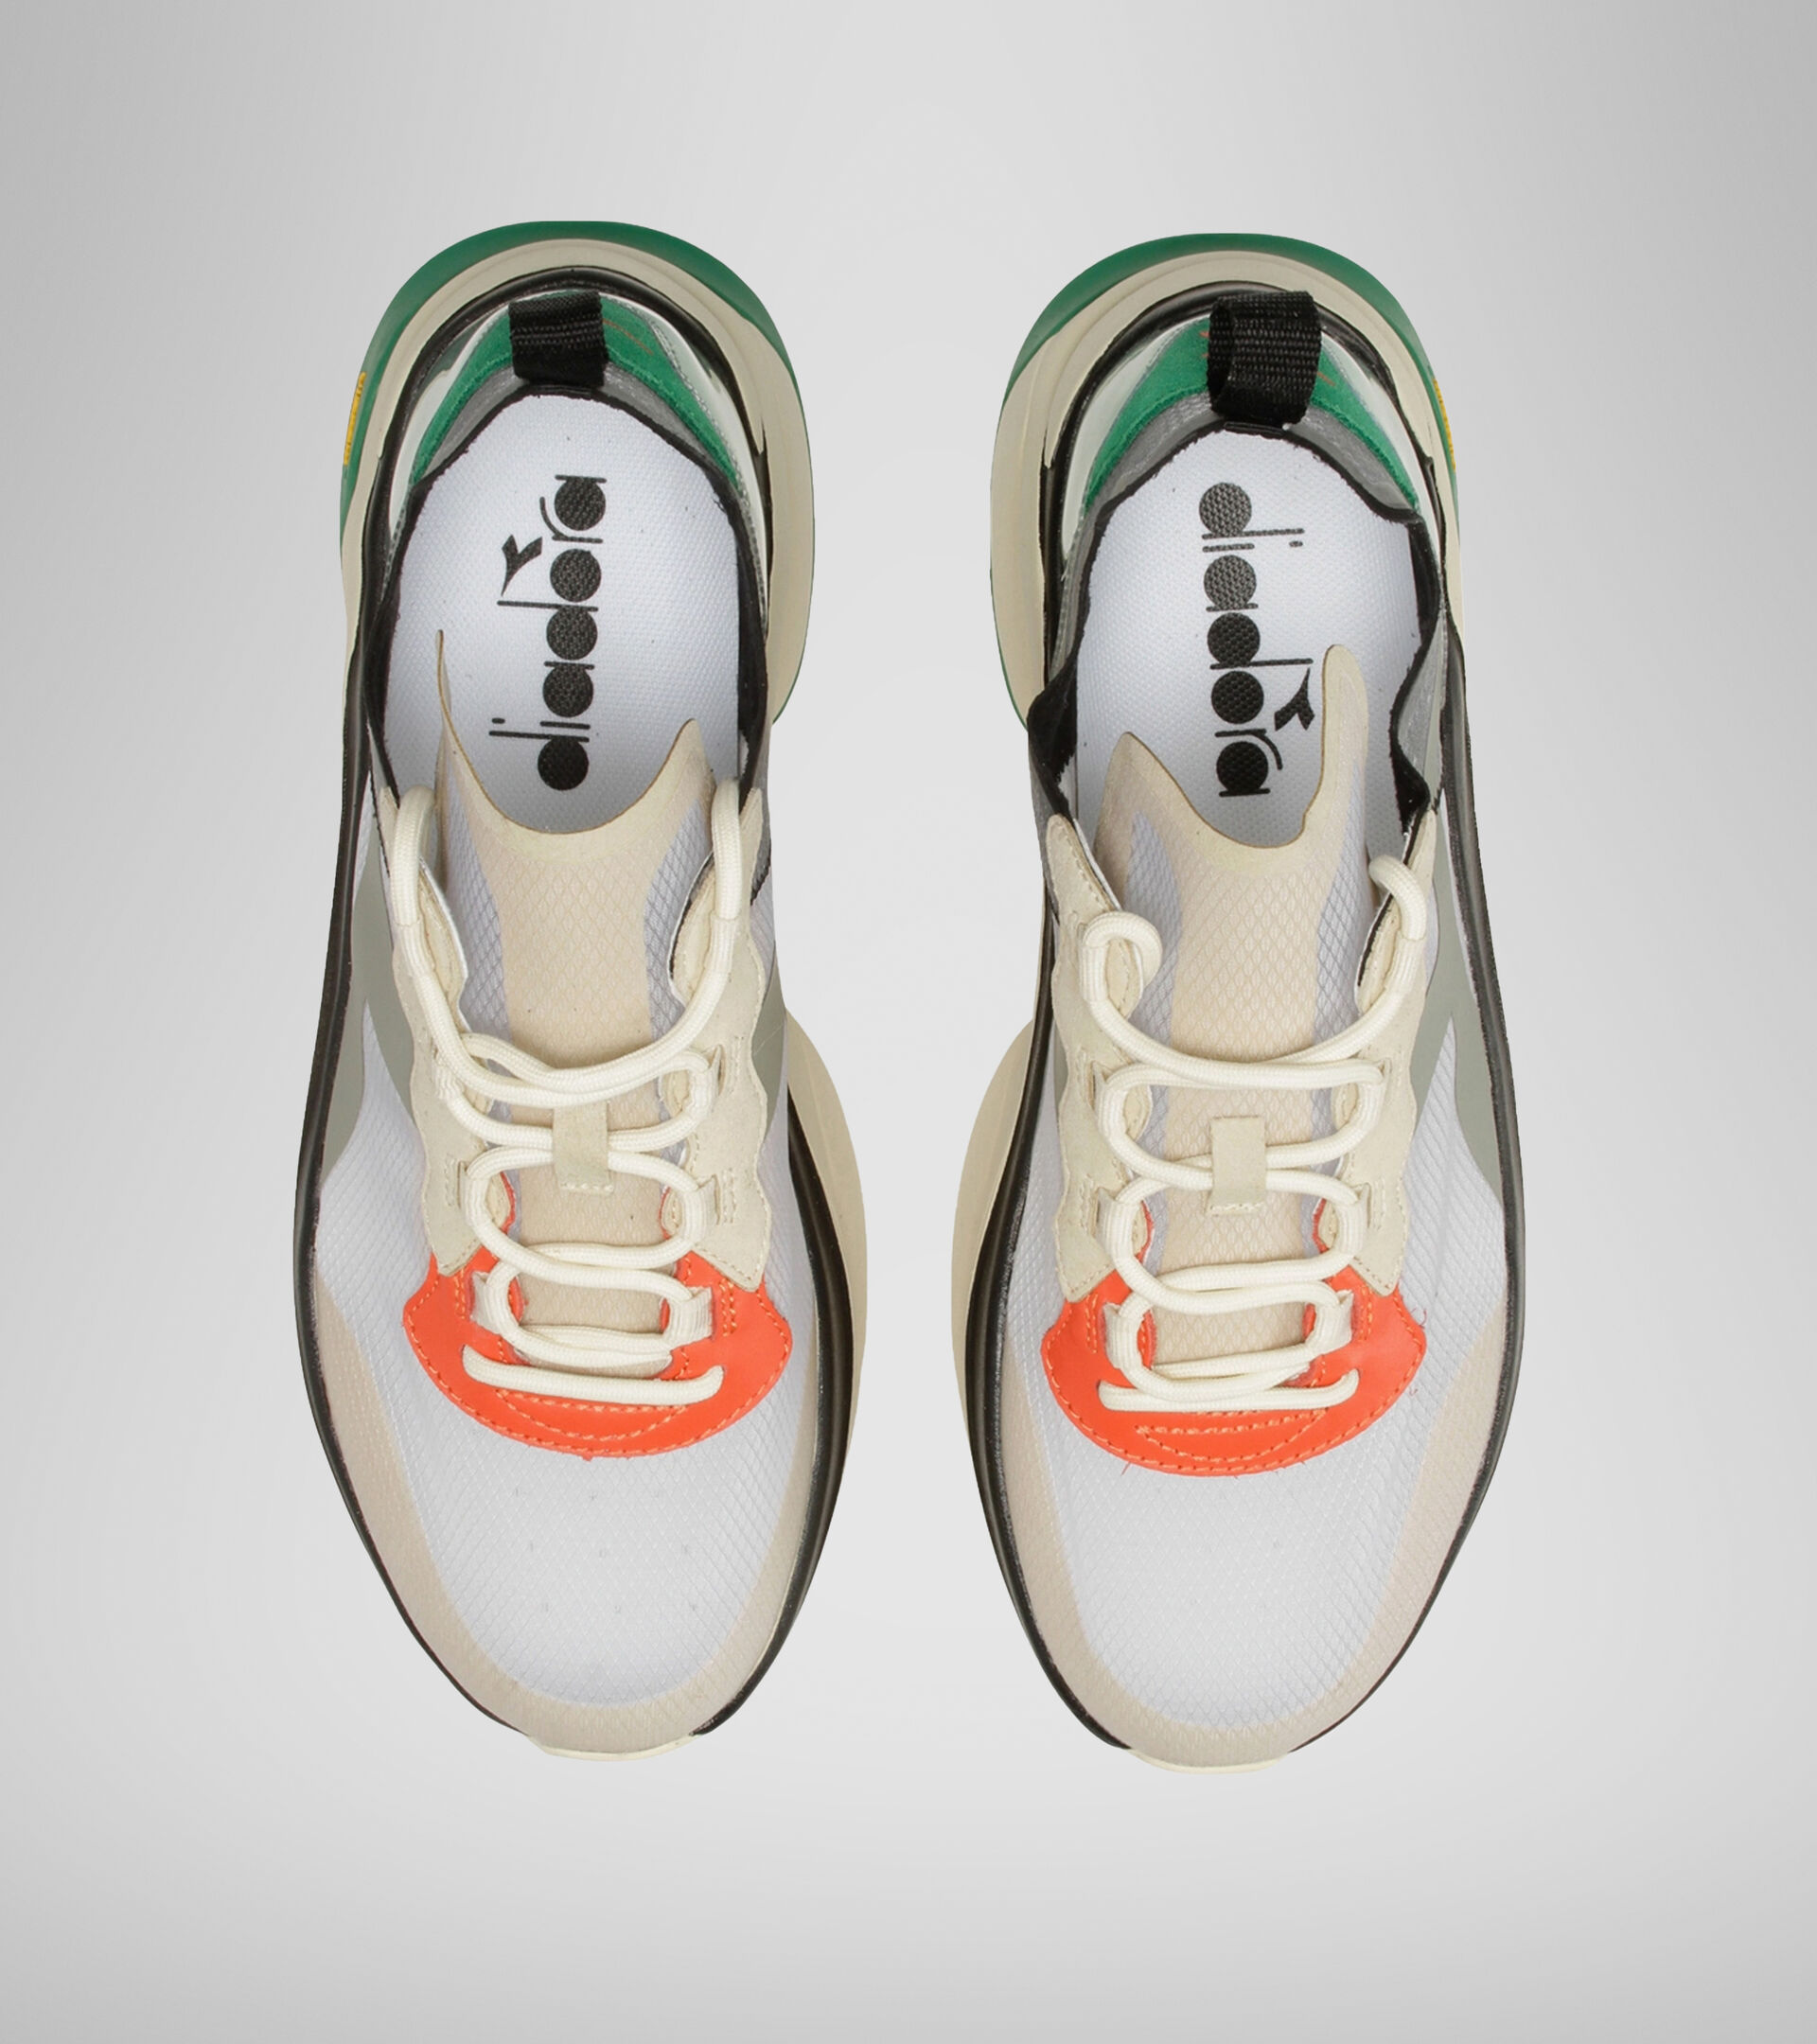 Zapatillas deportivas - Unisex TERRENA LIGHT BEIGE ANGORA - Diadora